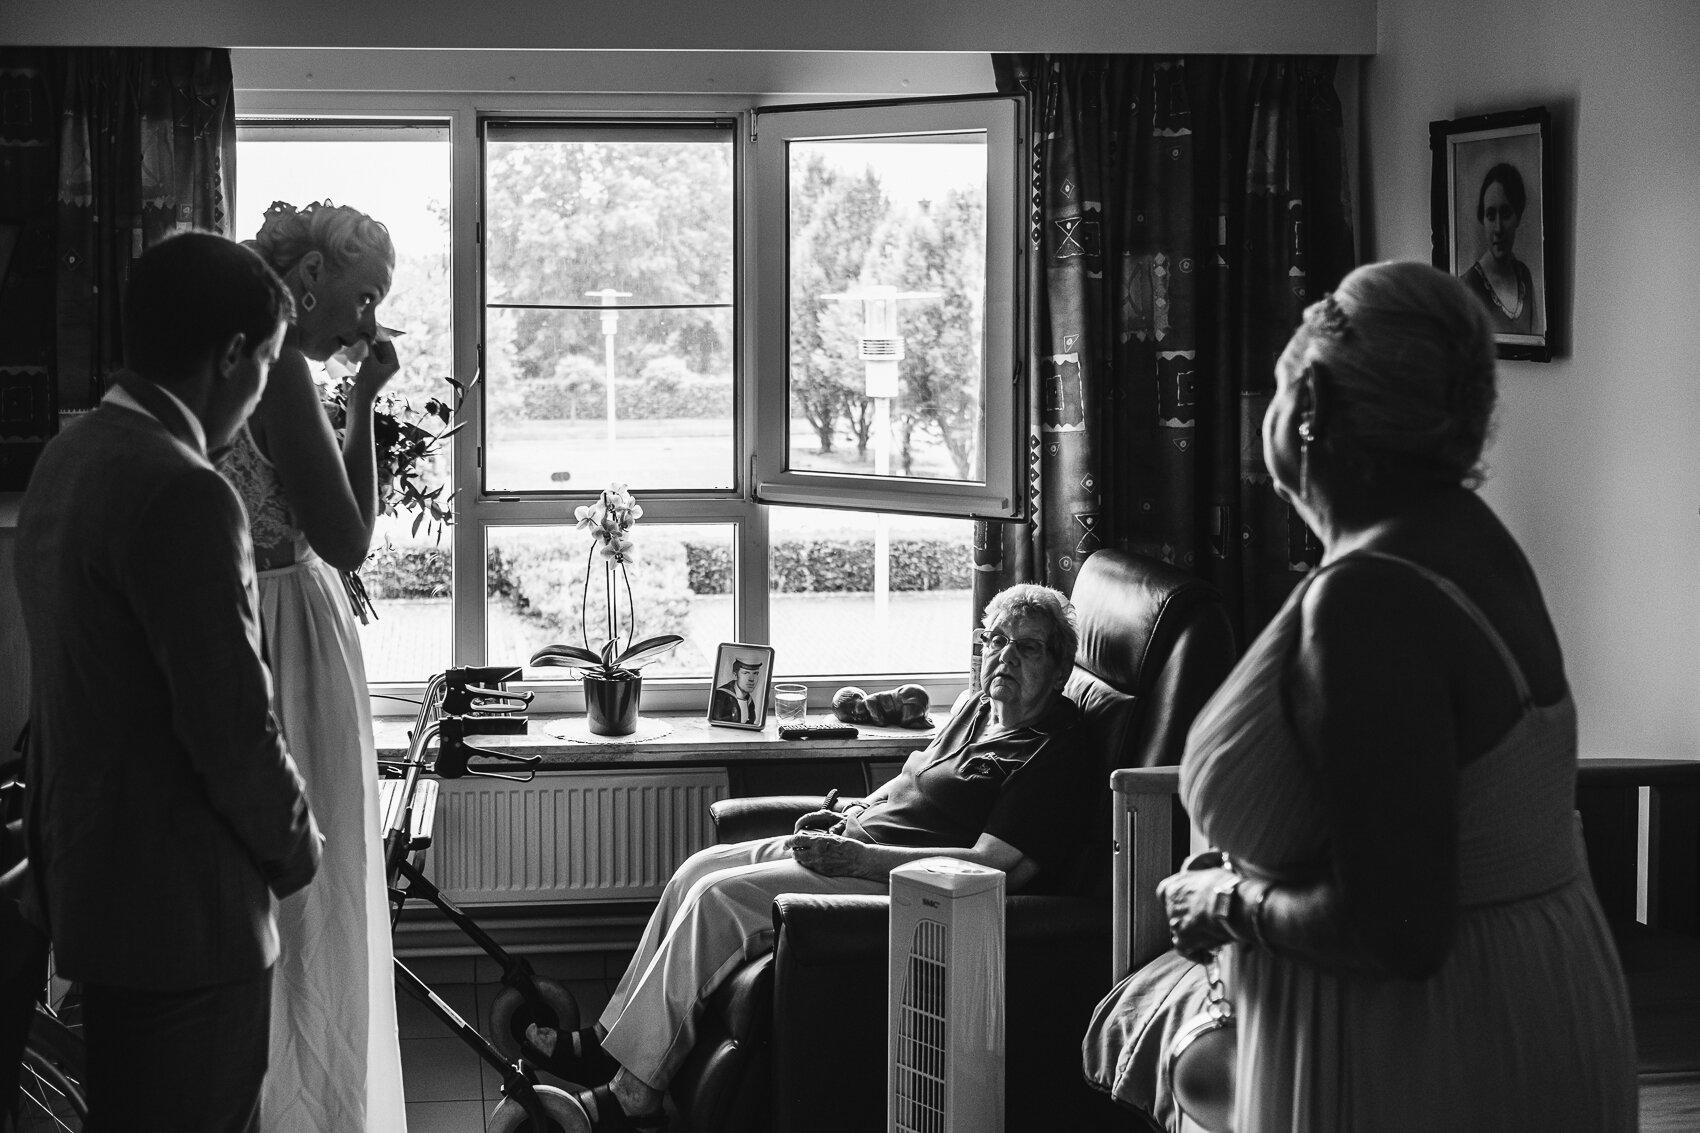 iso800 - huwelijksfotograaf isabo matthias verbeke foundation-16.jpg